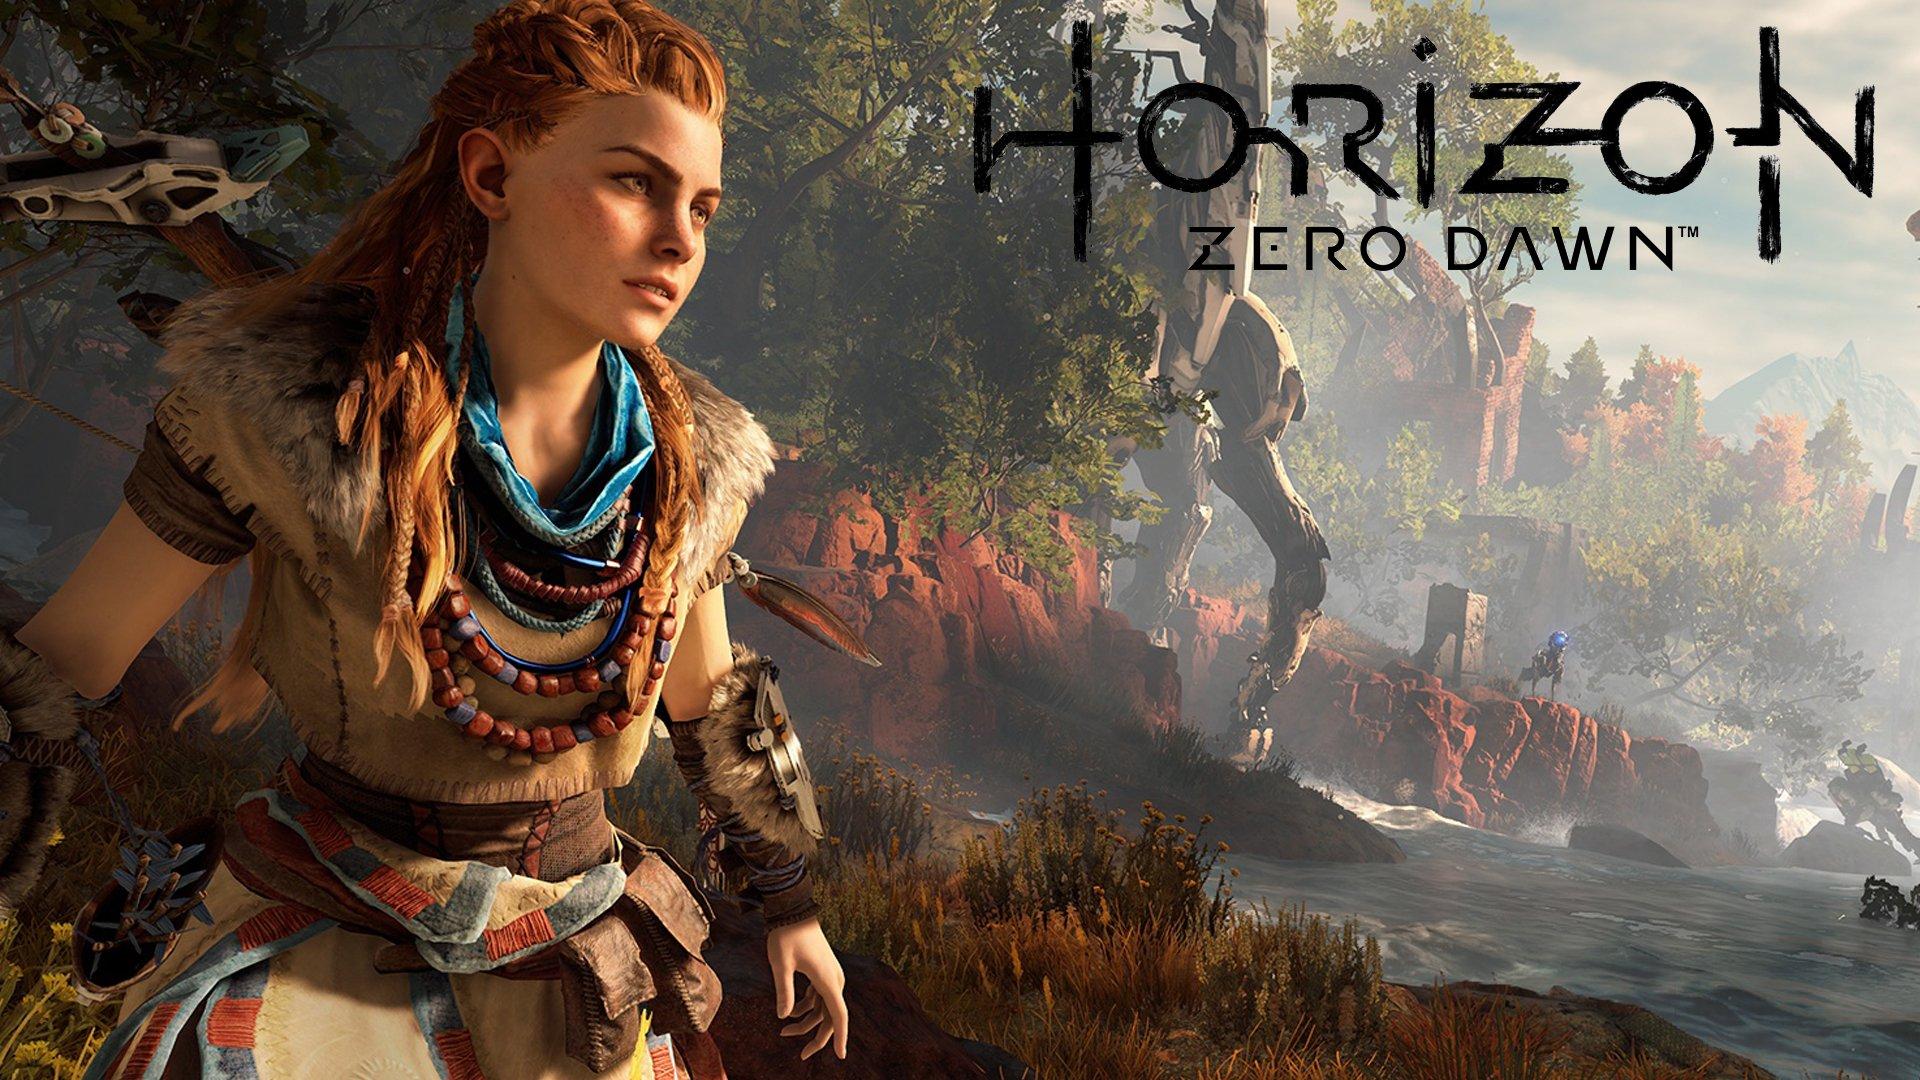 Horizon, Zero, Dawn, Sci Fi, Robot, Cyborg, Dinosaur, - Эксклюзивы Ps4 , HD Wallpaper & Backgrounds